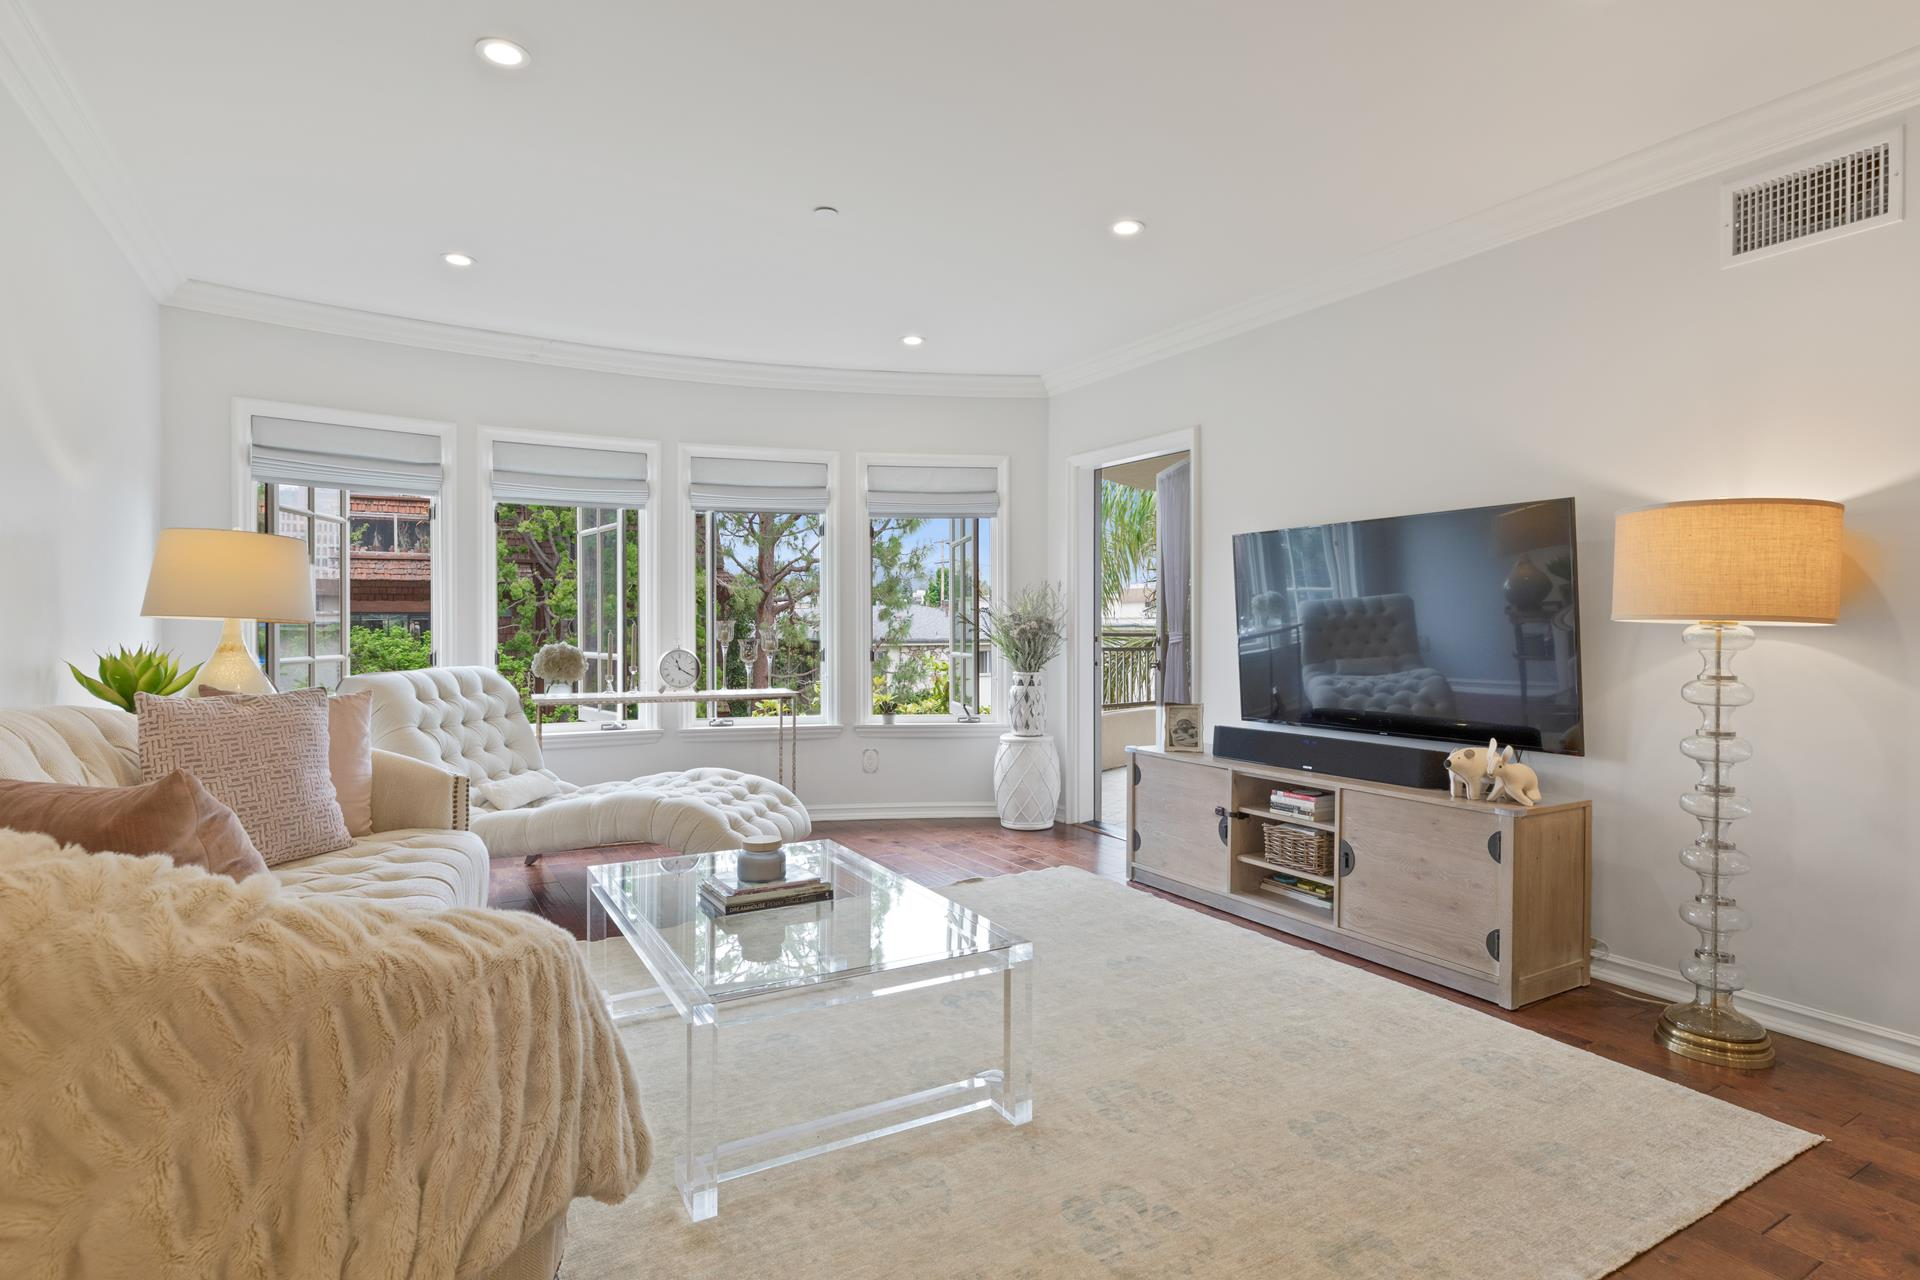 1000 GRANVILLE Avenue, 304 - Brentwood, California